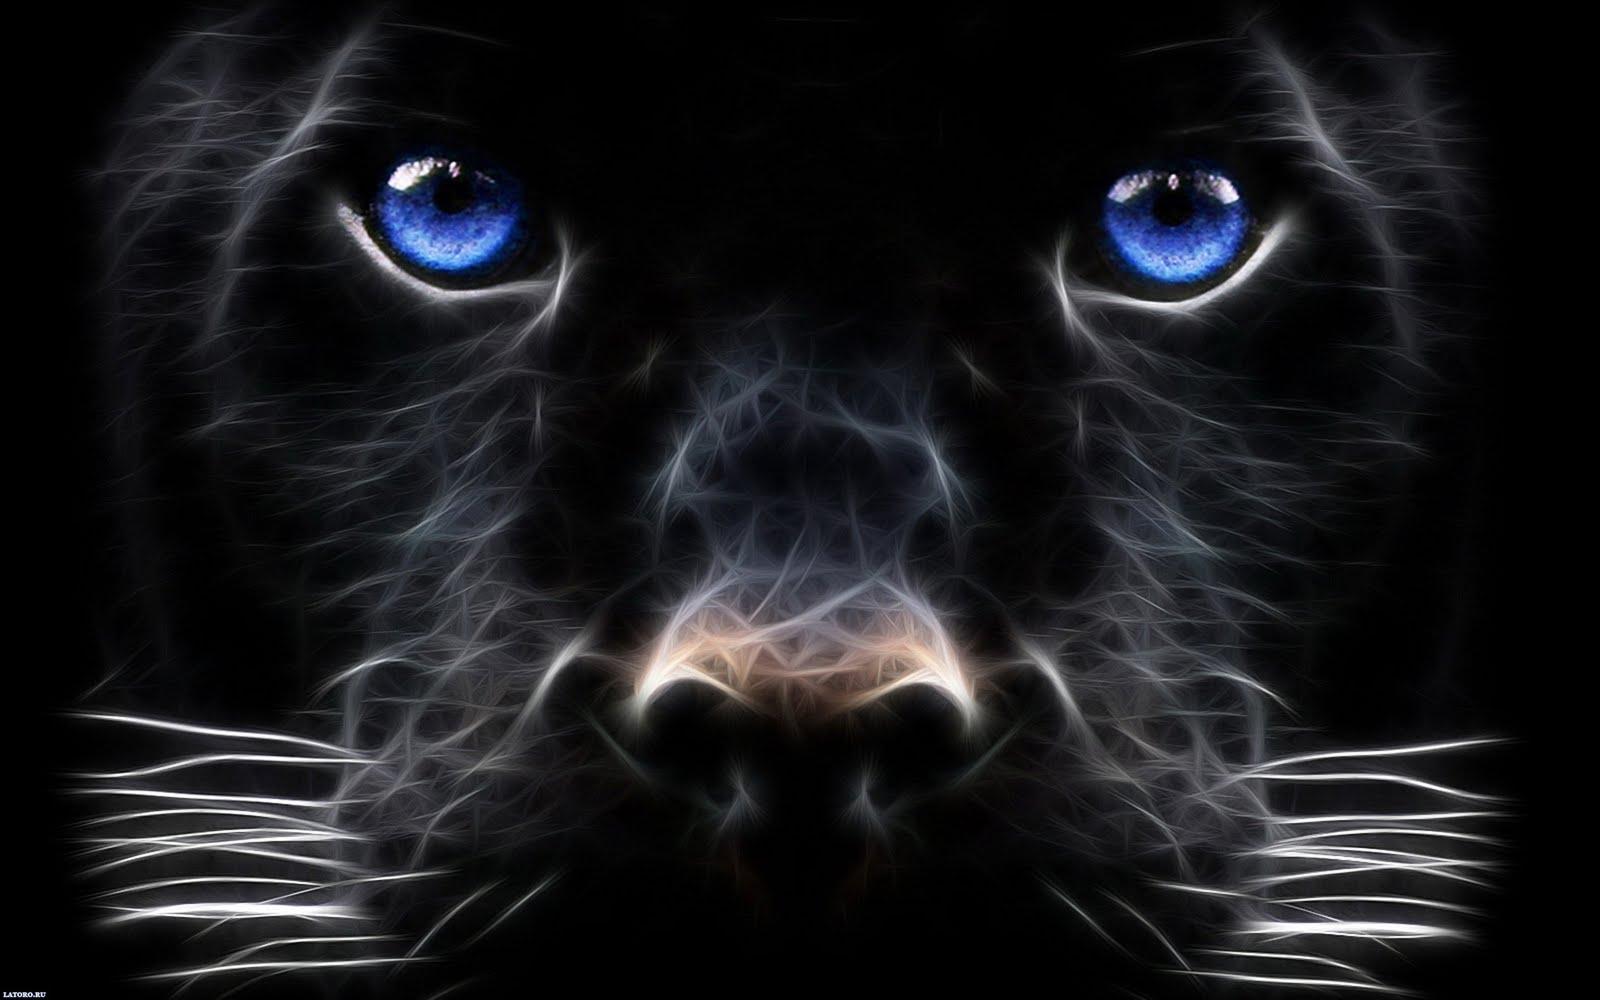 http://1.bp.blogspot.com/-oHzOHor0tHs/TWU1yfXktKI/AAAAAAAASfg/AmCnwg-7HEY/s1600/desktop-wallpapers-dog.jpg